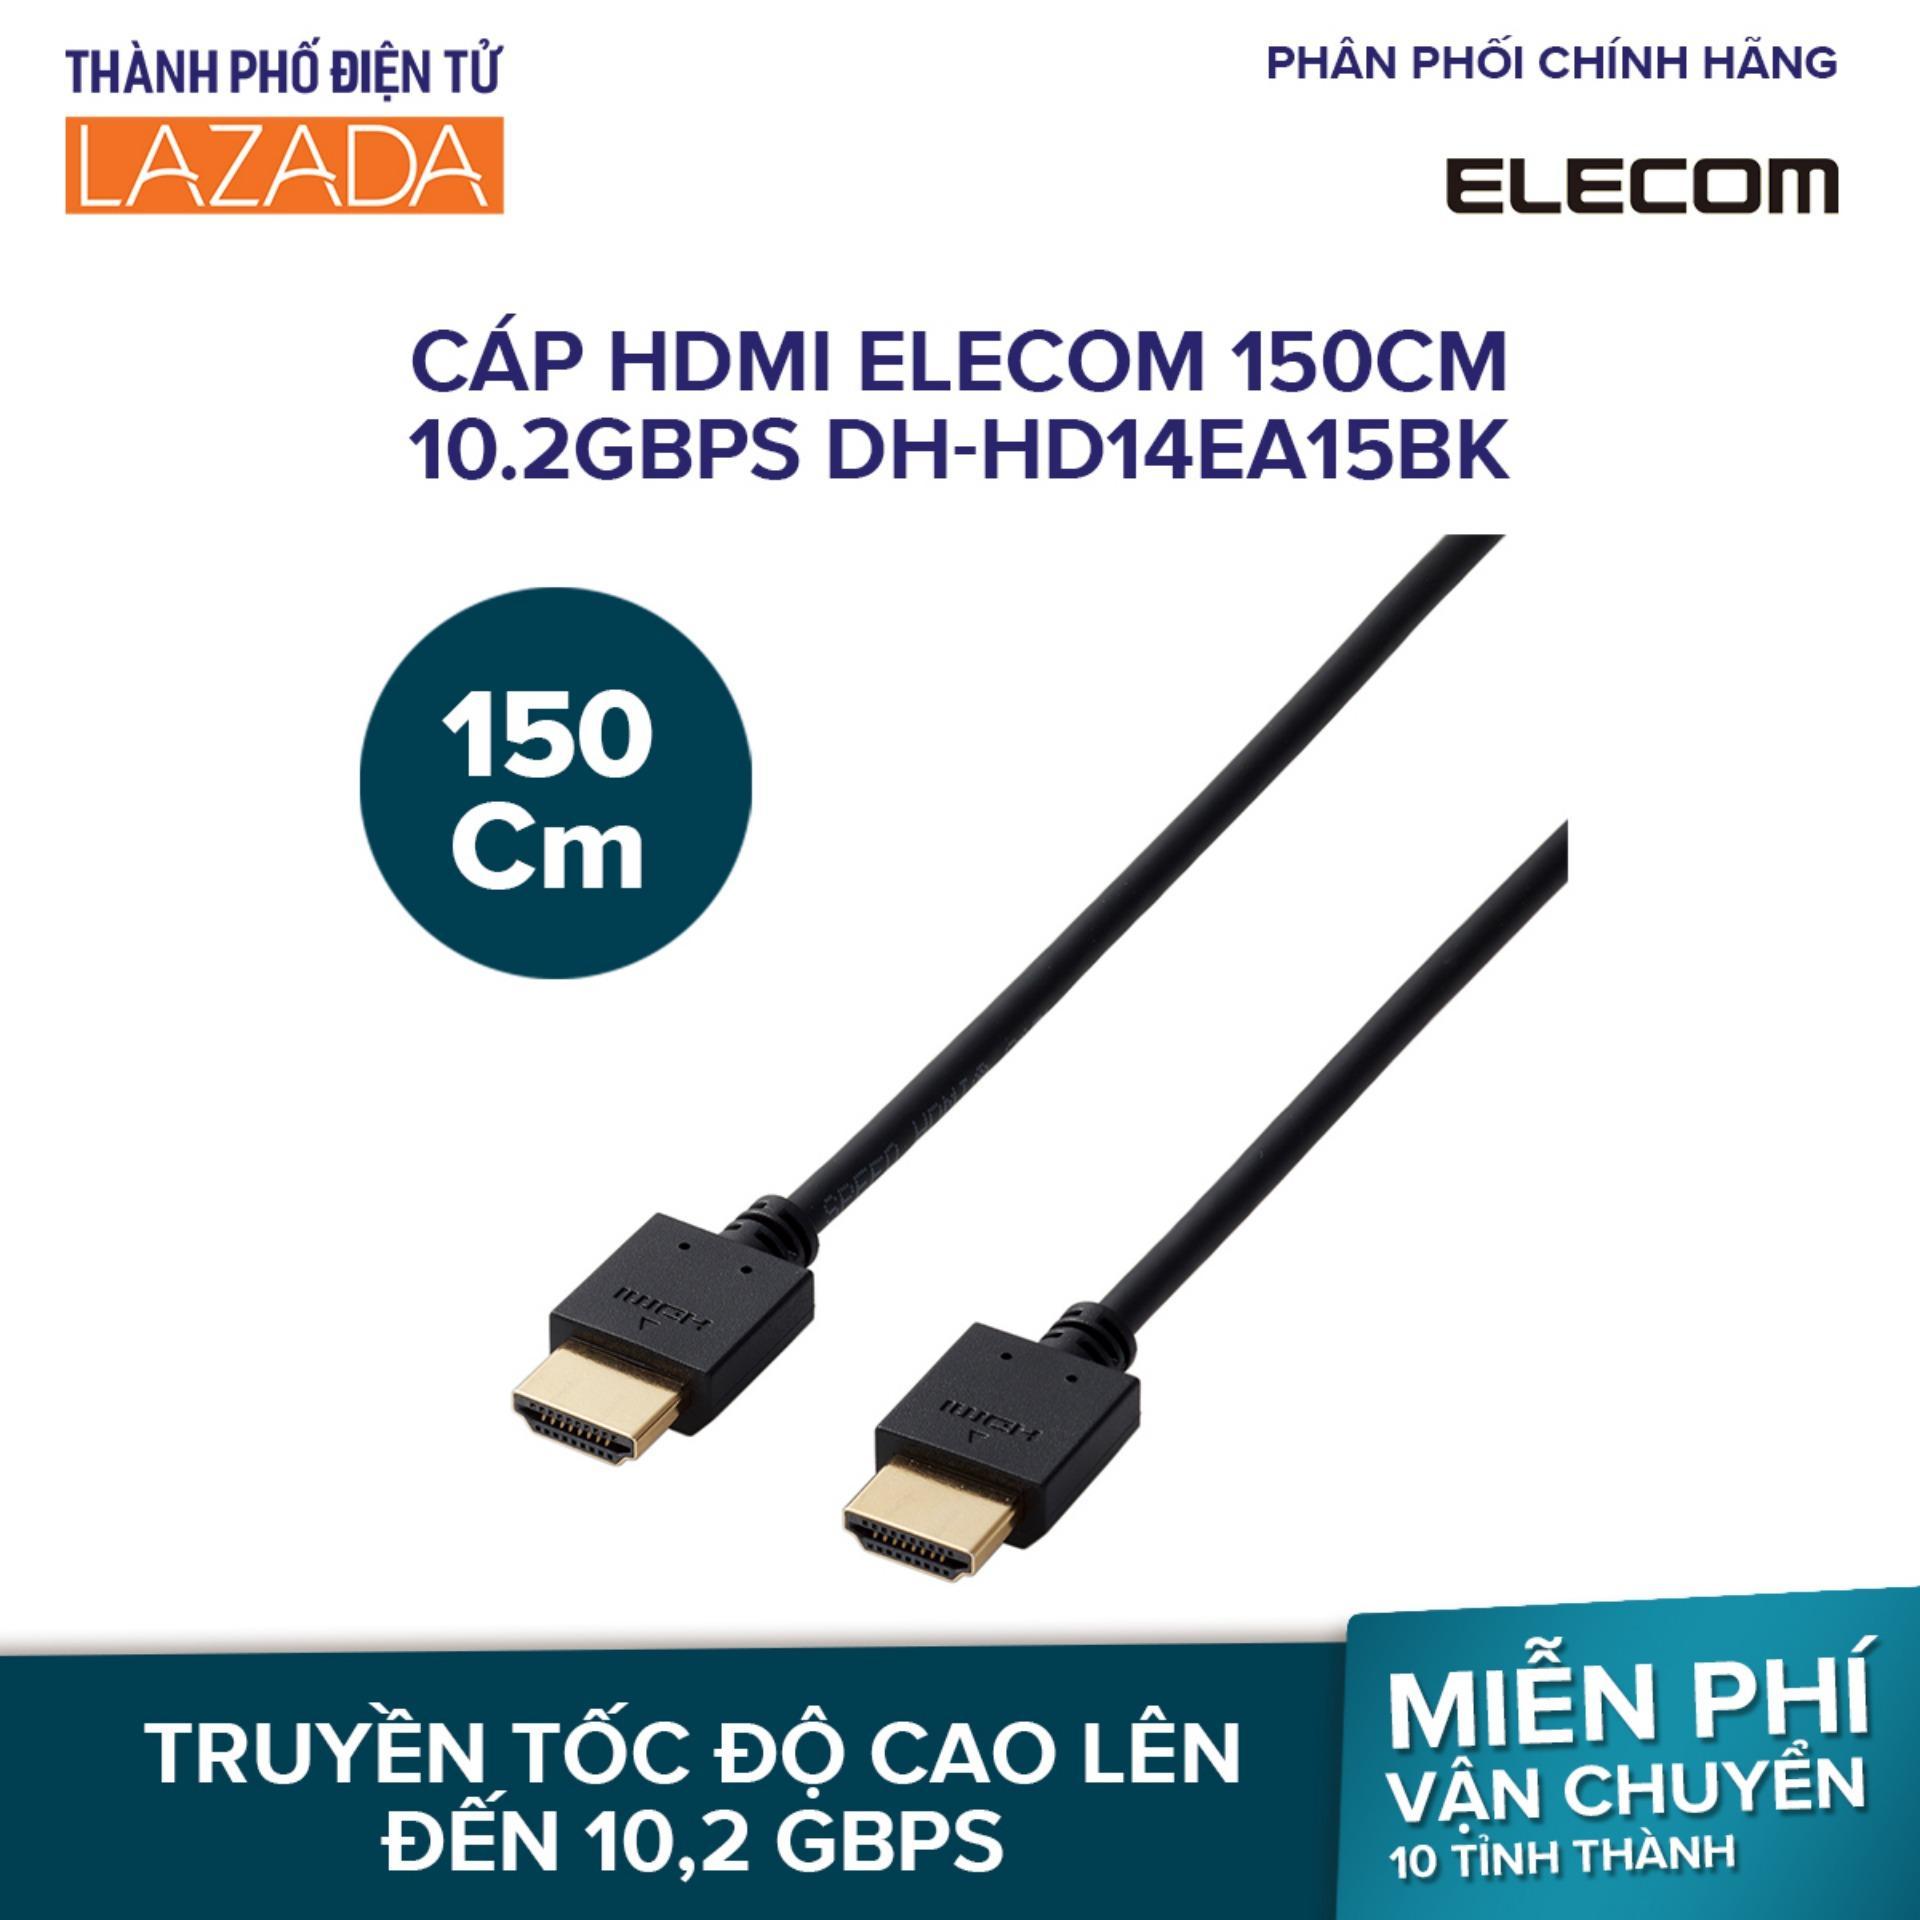 Cáp HDMI Elecom 150cm 10.2Gbps DH-HD14EA15BK